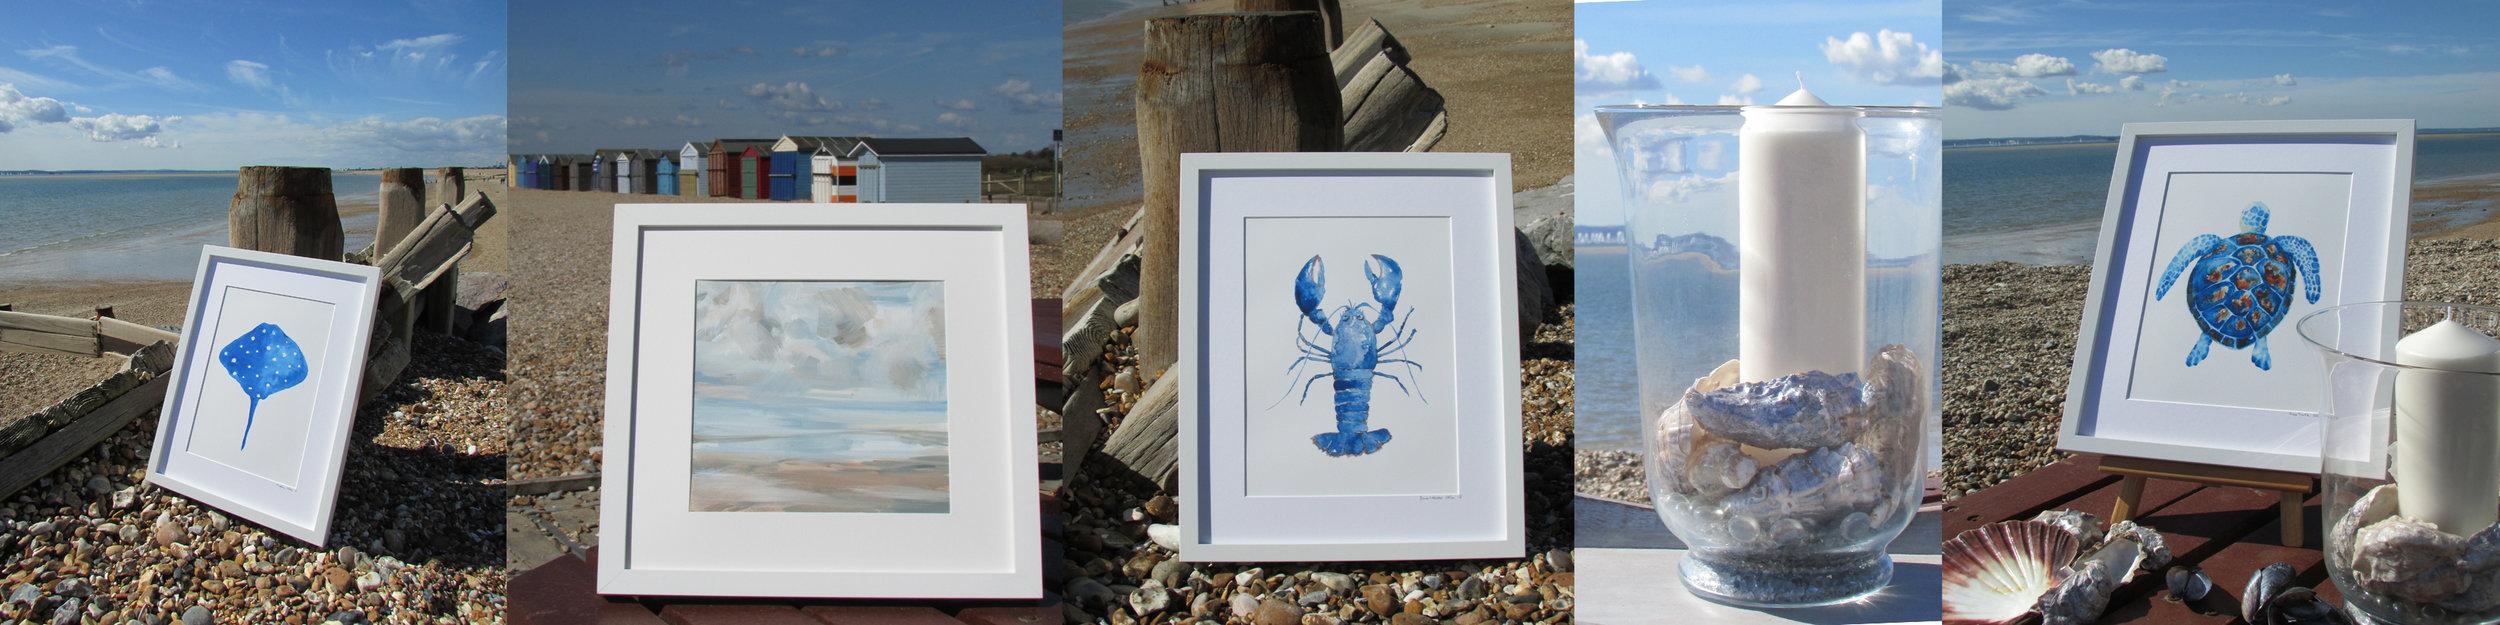 Stingray, Acrylic Beach Art, Blue Lobster, Hurricane, Sea Turtle Watercolour Prints